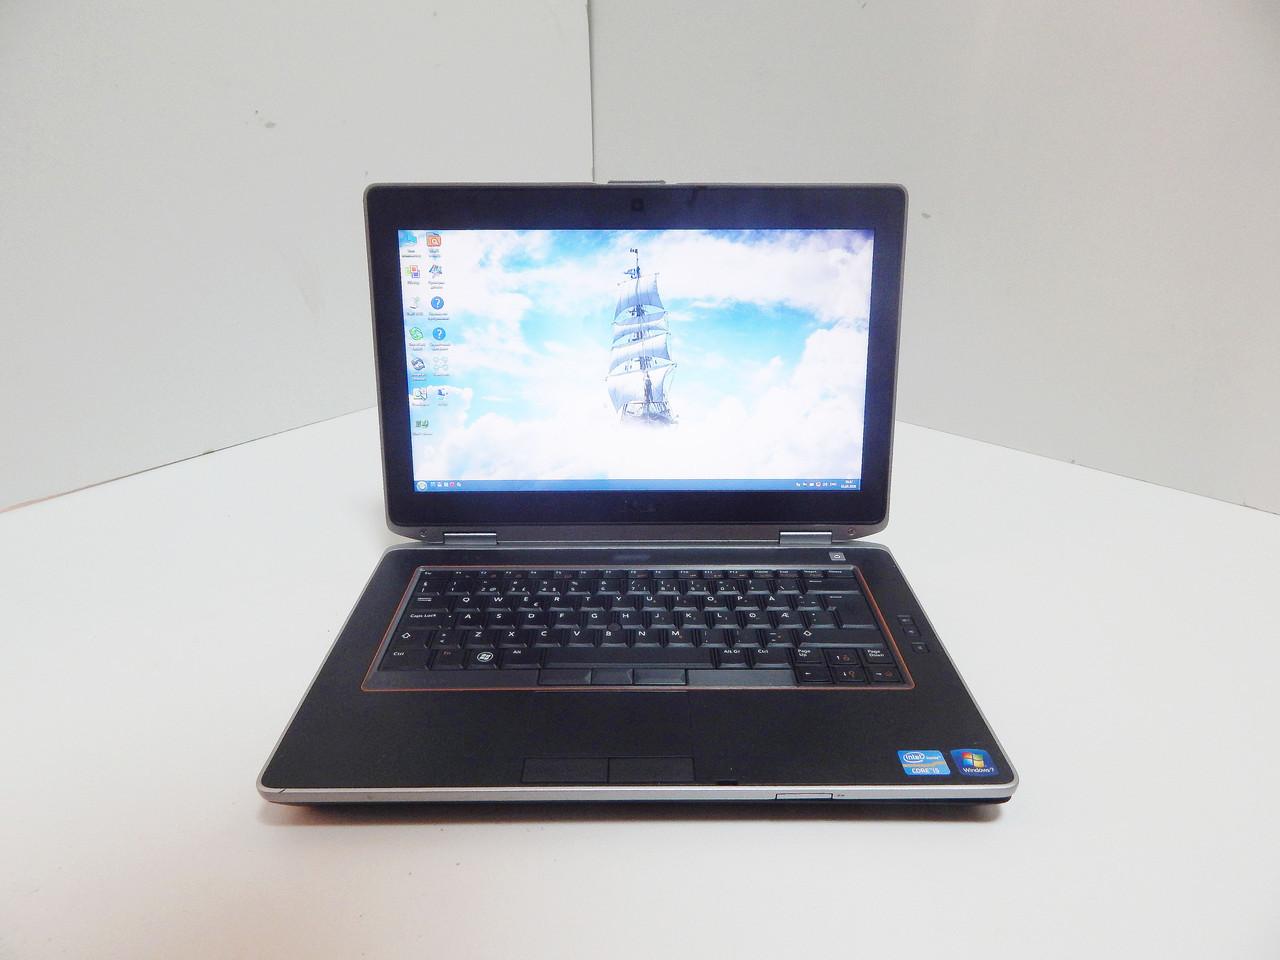 "Ноутбук Dell E6420 14"" LED / Intel Core i7-2620M (3.4 ГГц) / 8 ГБ /SSD 128 ГБ /Intel HD Graphics 3000"